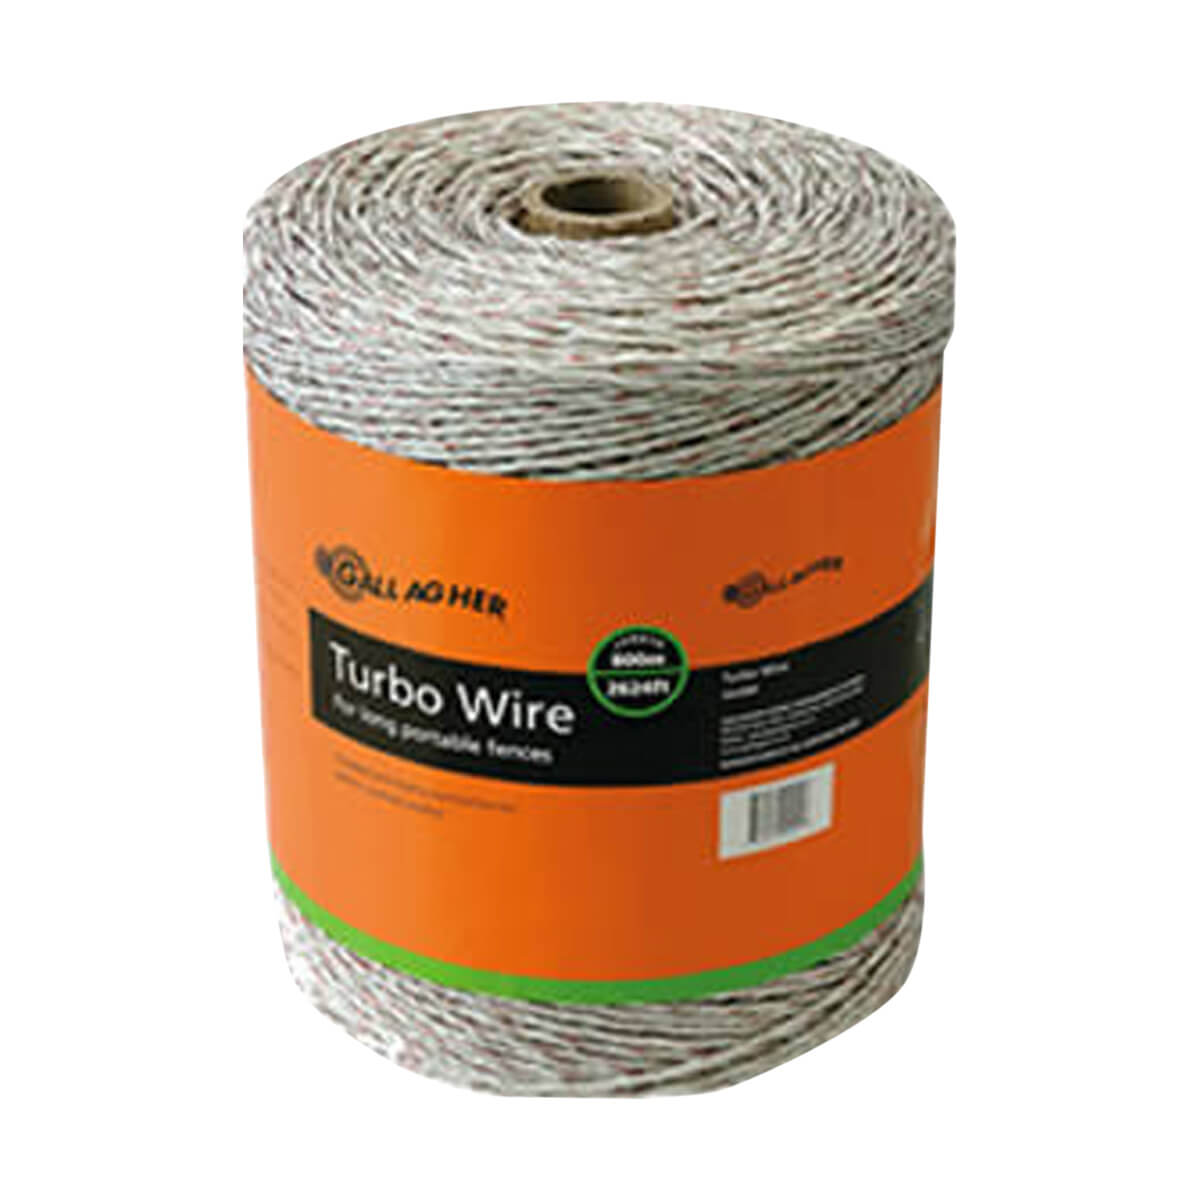 Gallagher Turbo Wire - White - 200 m